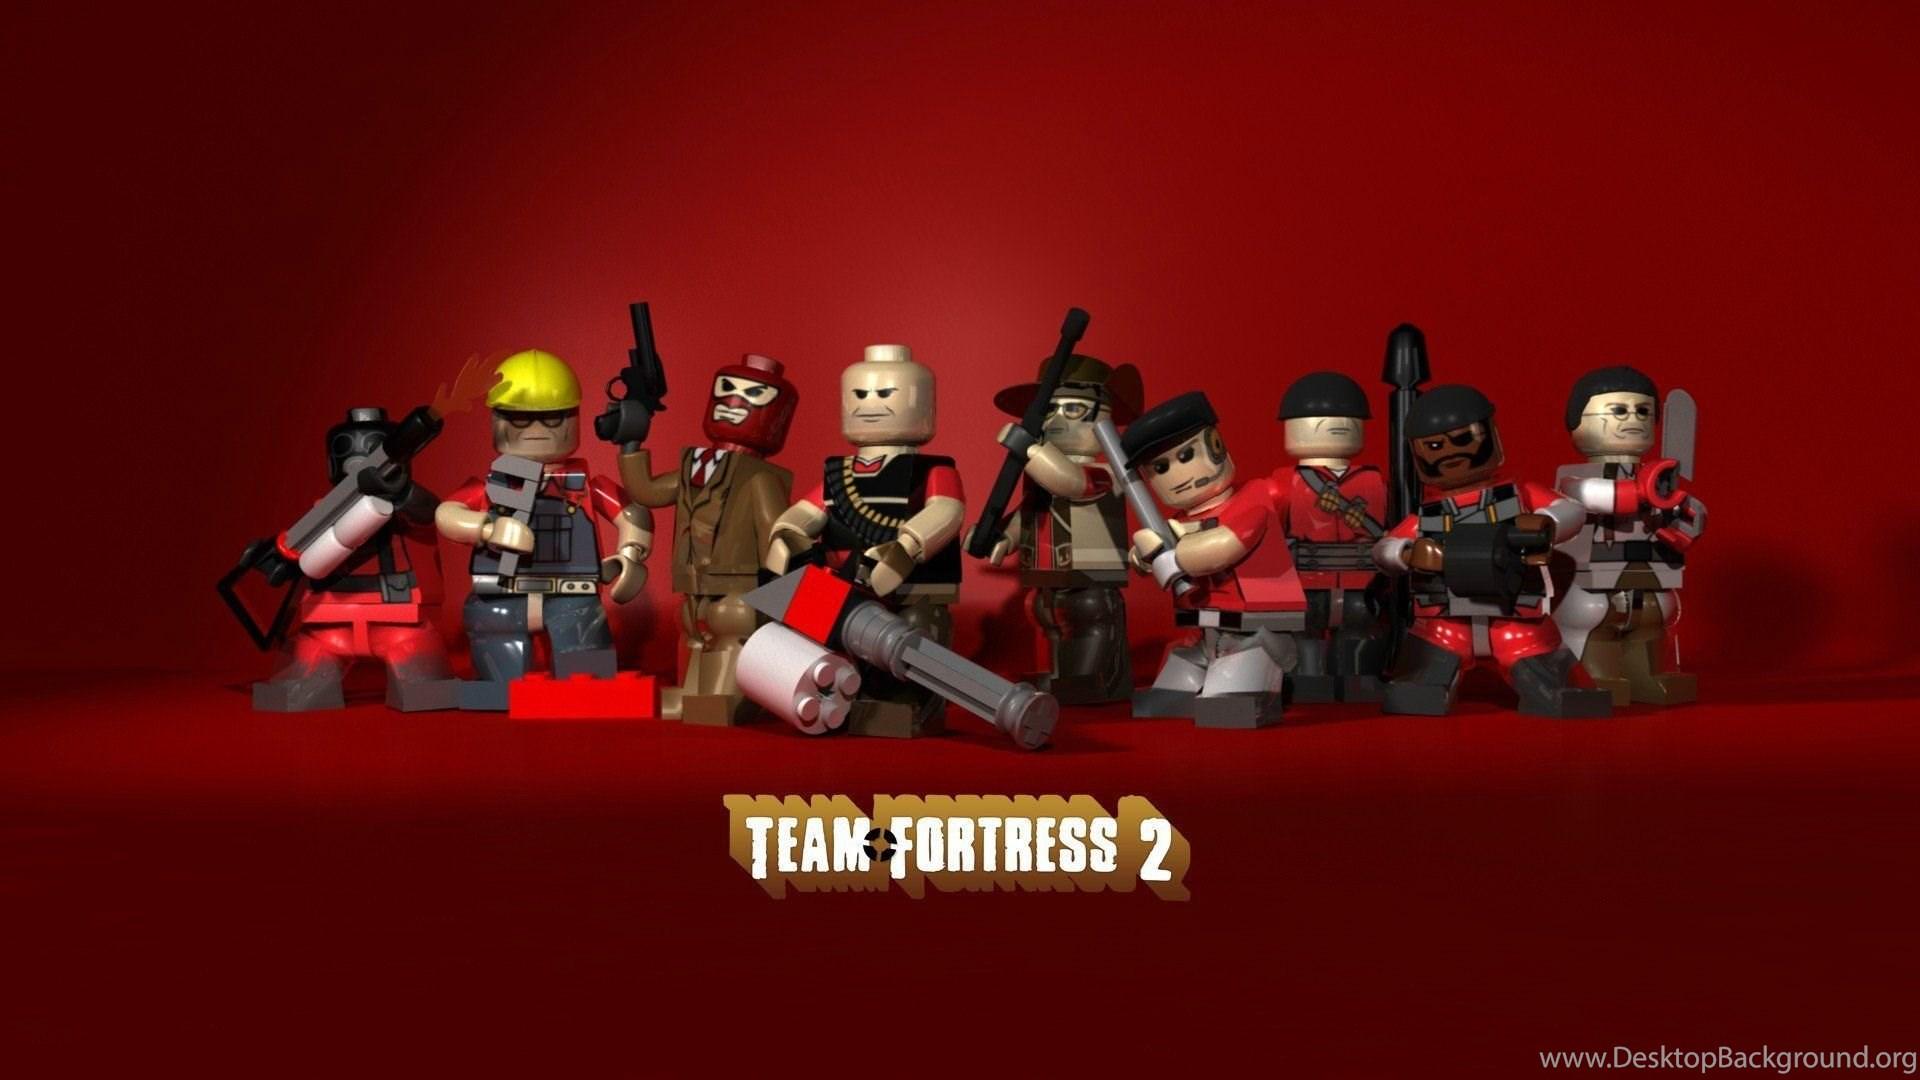 Video Games Team Fortress 2 Legos Wallpapers Desktop Background